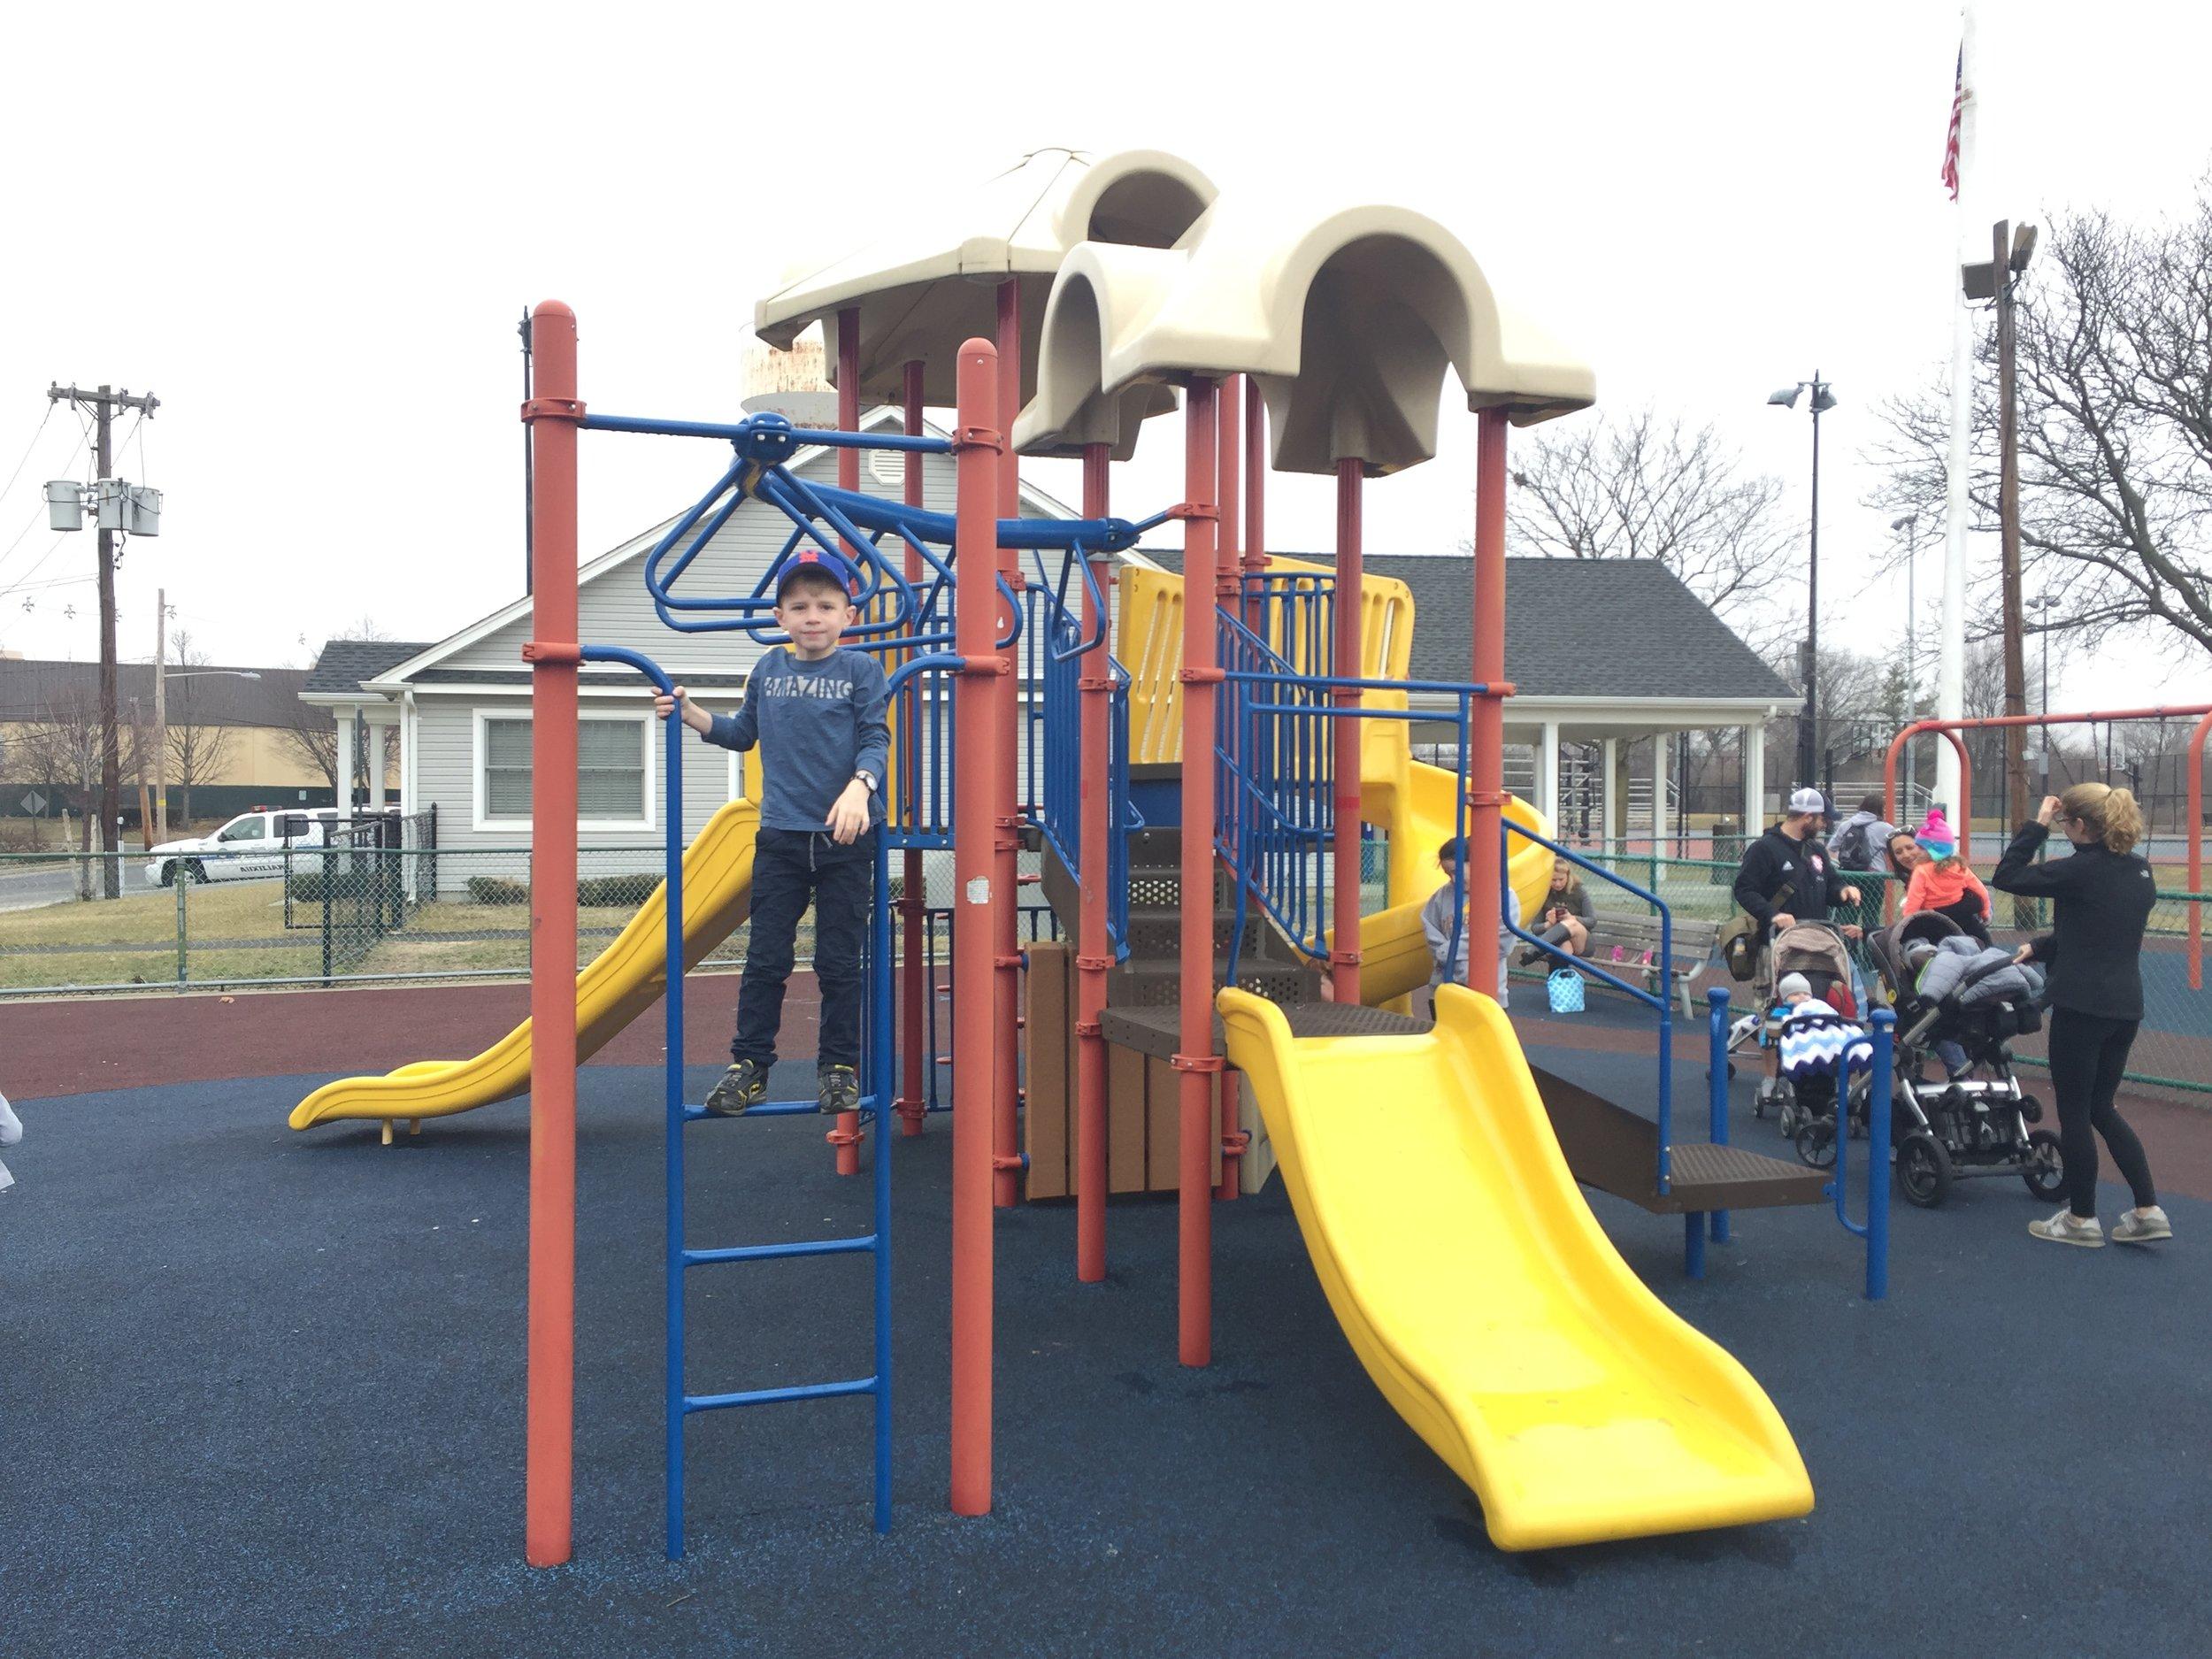 Slides at Centennial Playground